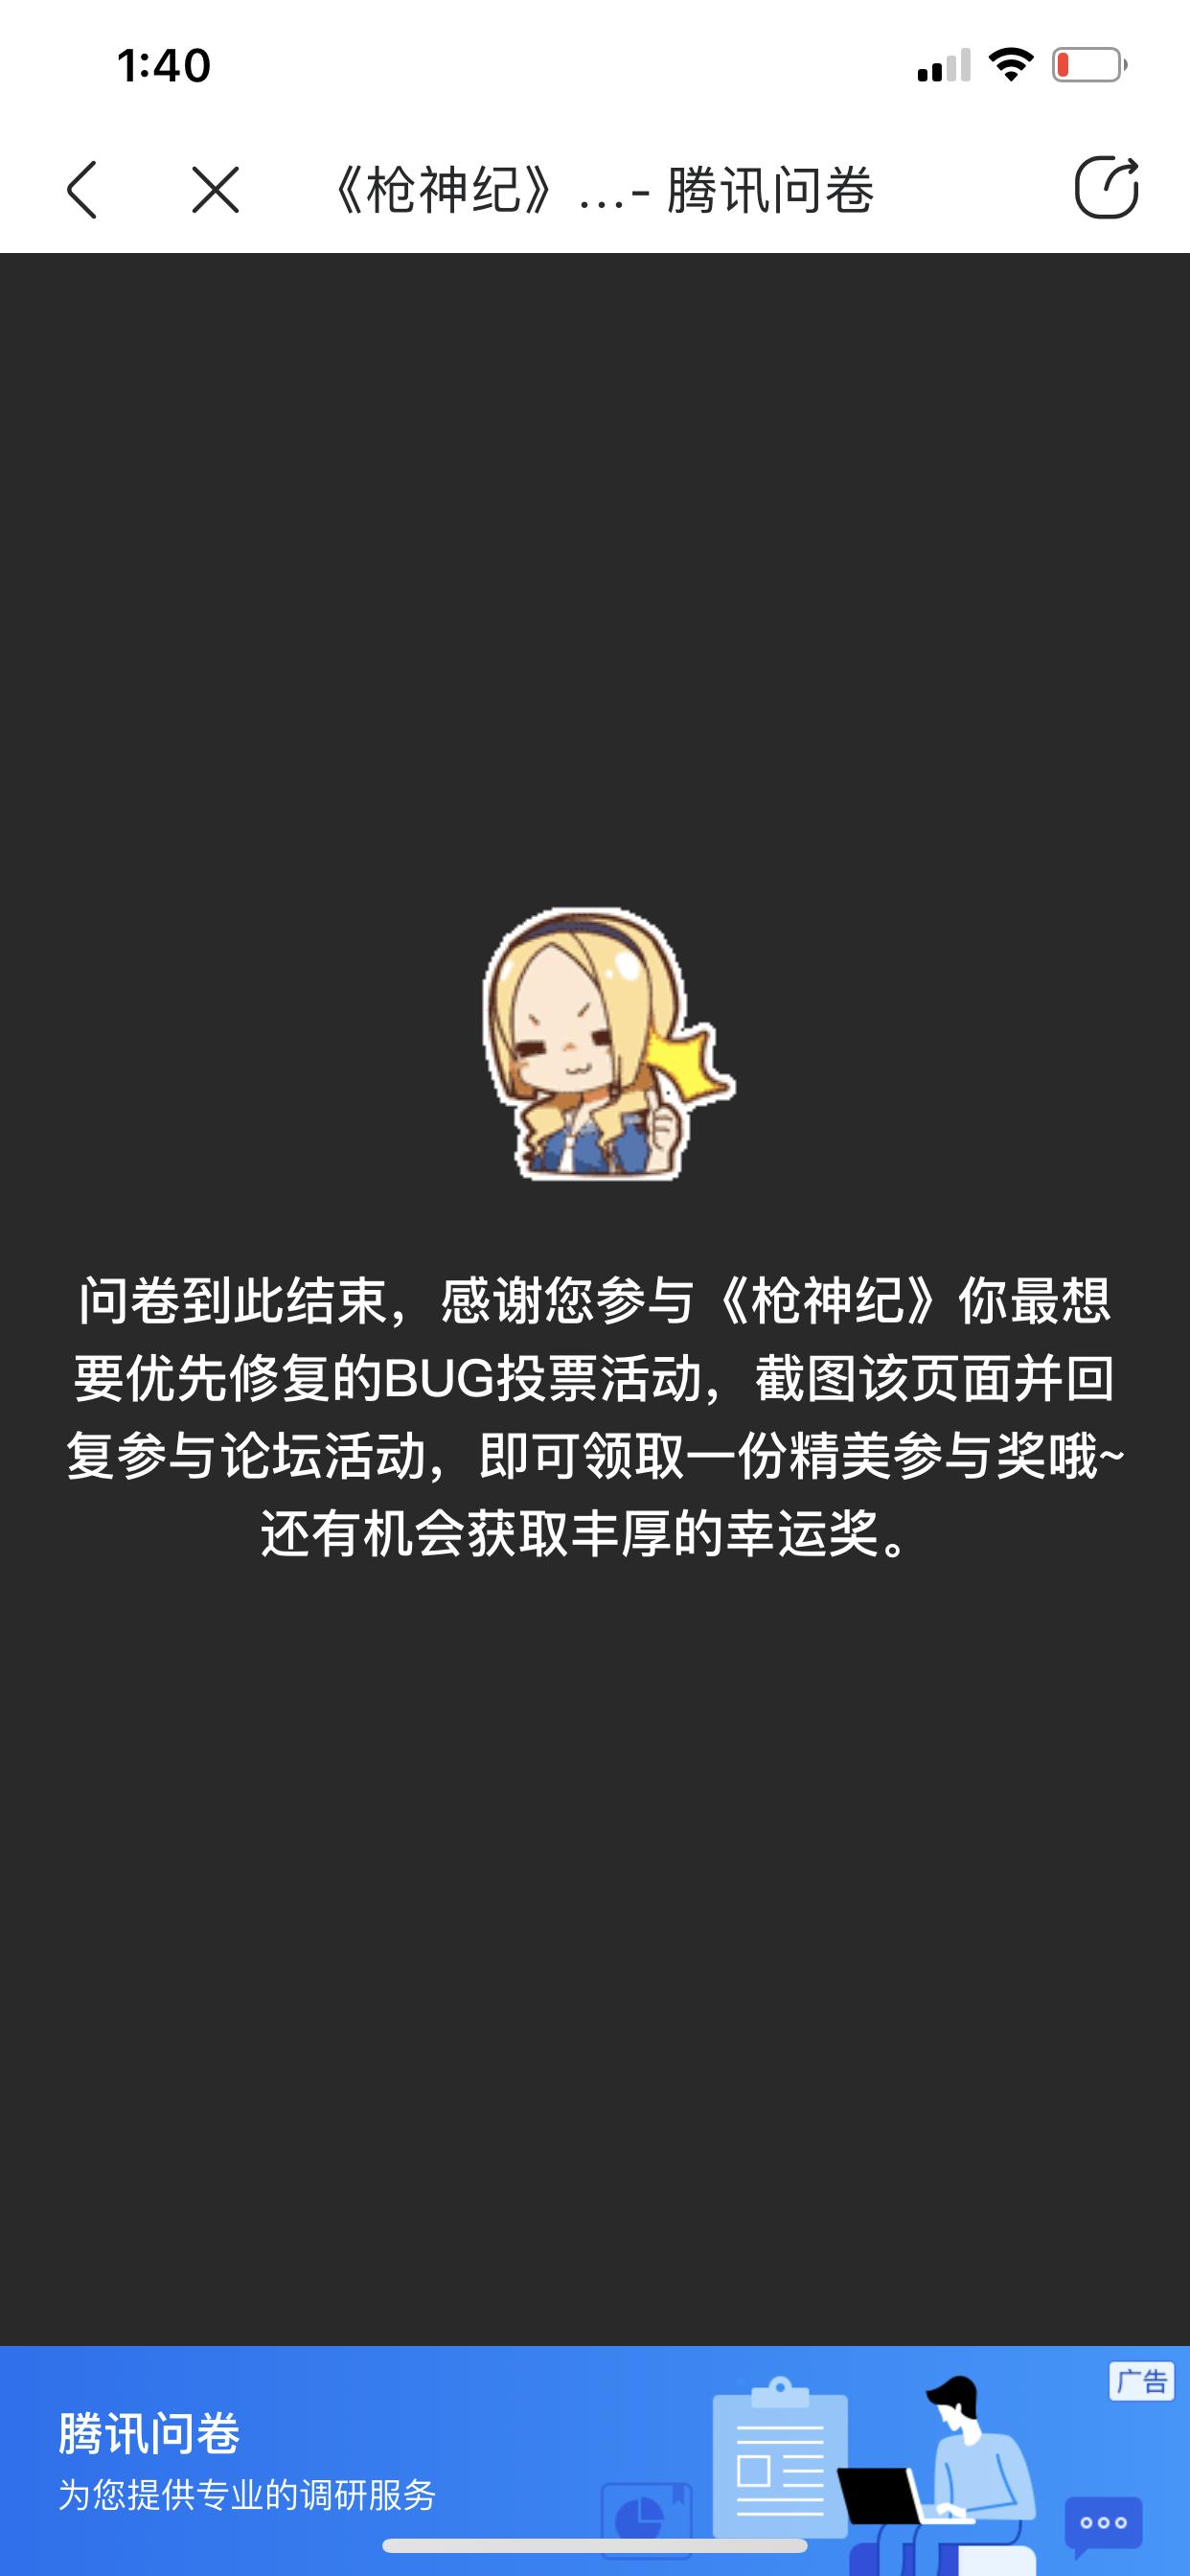 QQ图片20200310015205.png